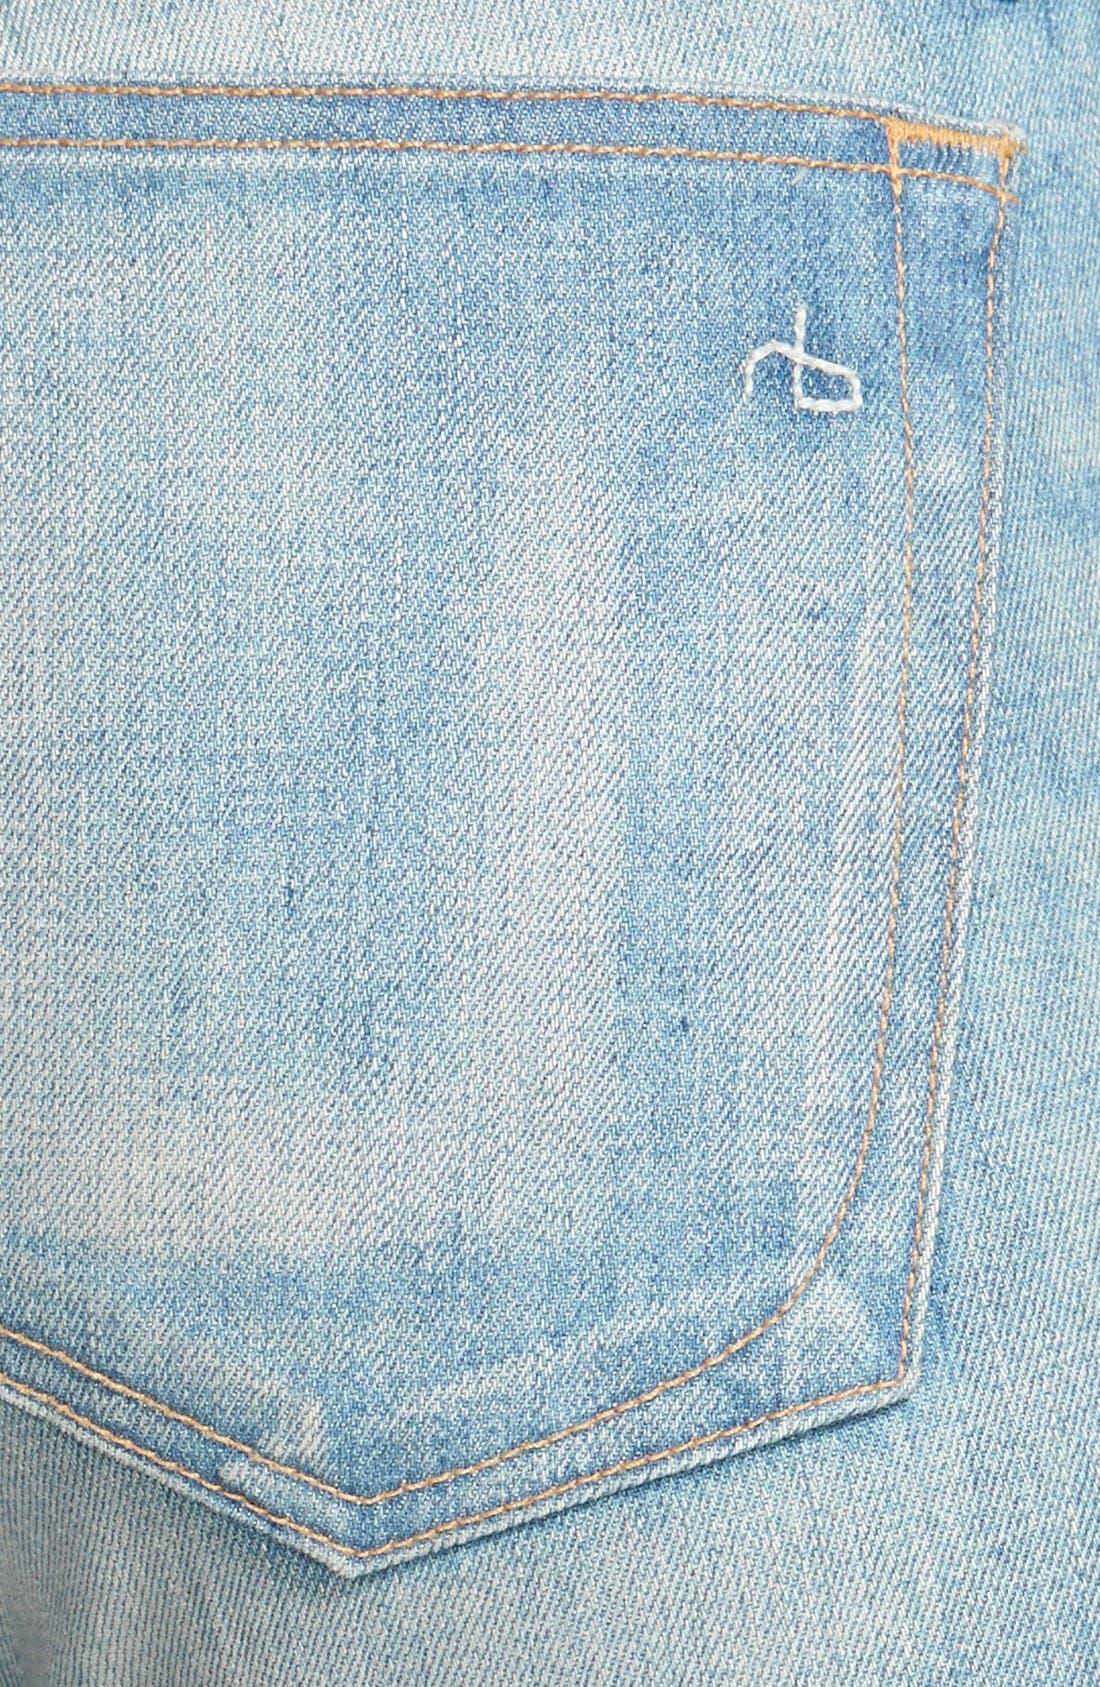 Alternate Image 3  - rag & bone/JEAN 'The Dre' Slim Fit Boyfriend Jeans (Greencast)